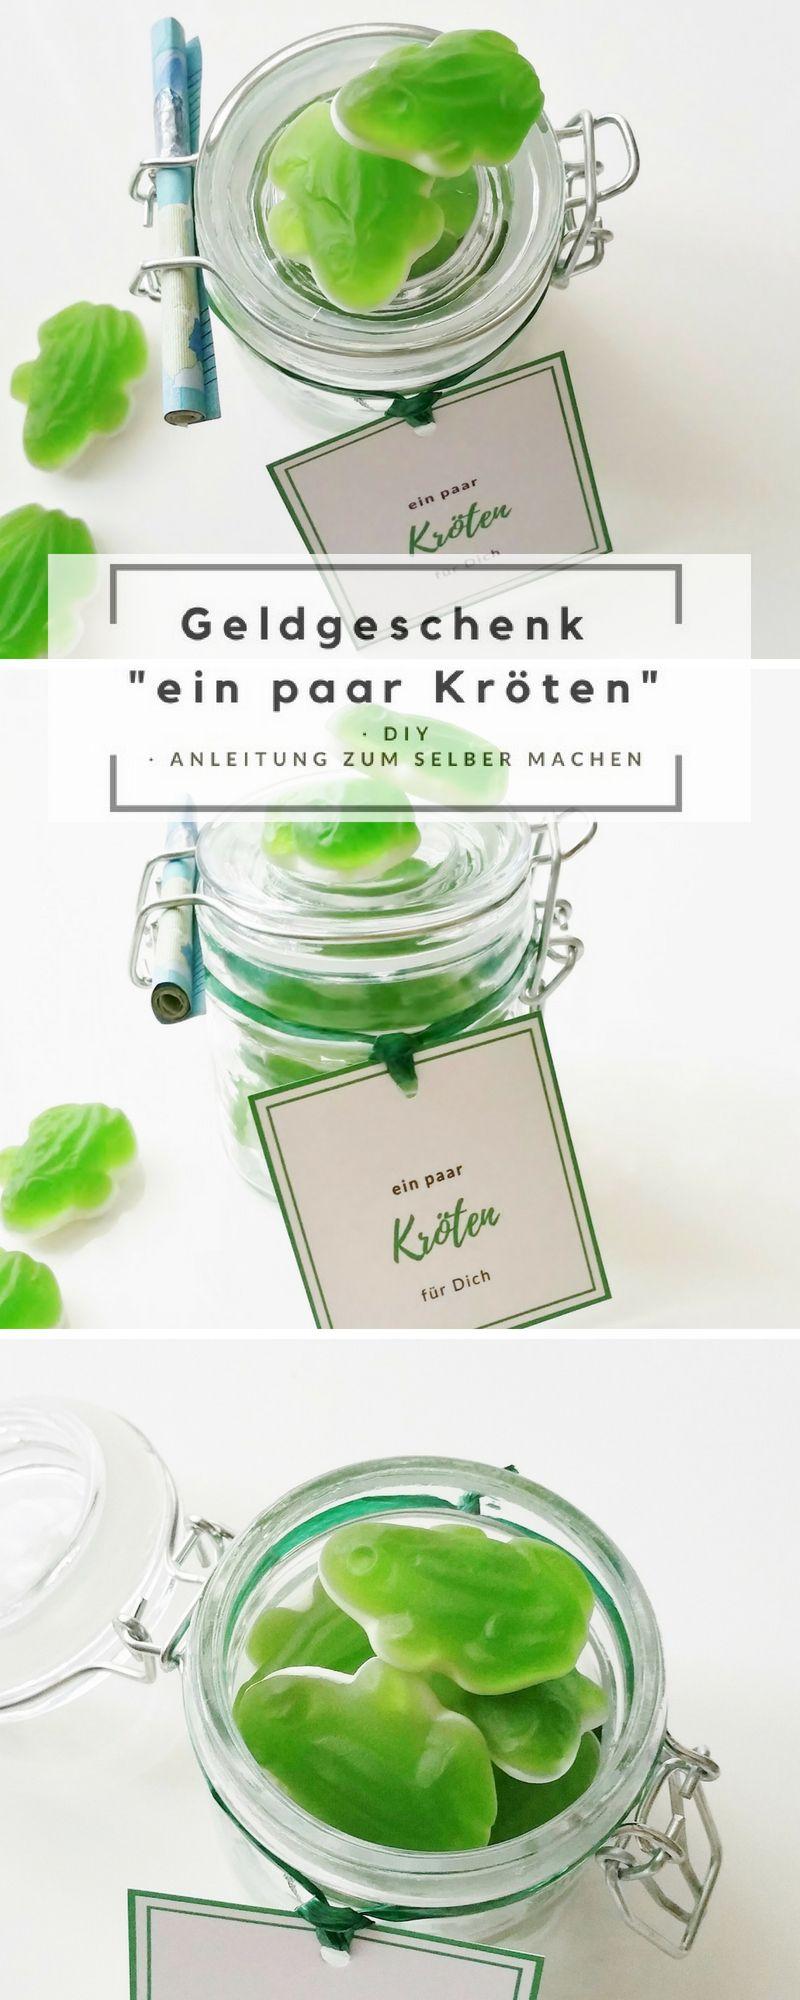 "geldgeschenk im glas ""kröten"" & free printable diy | geschenkideen"